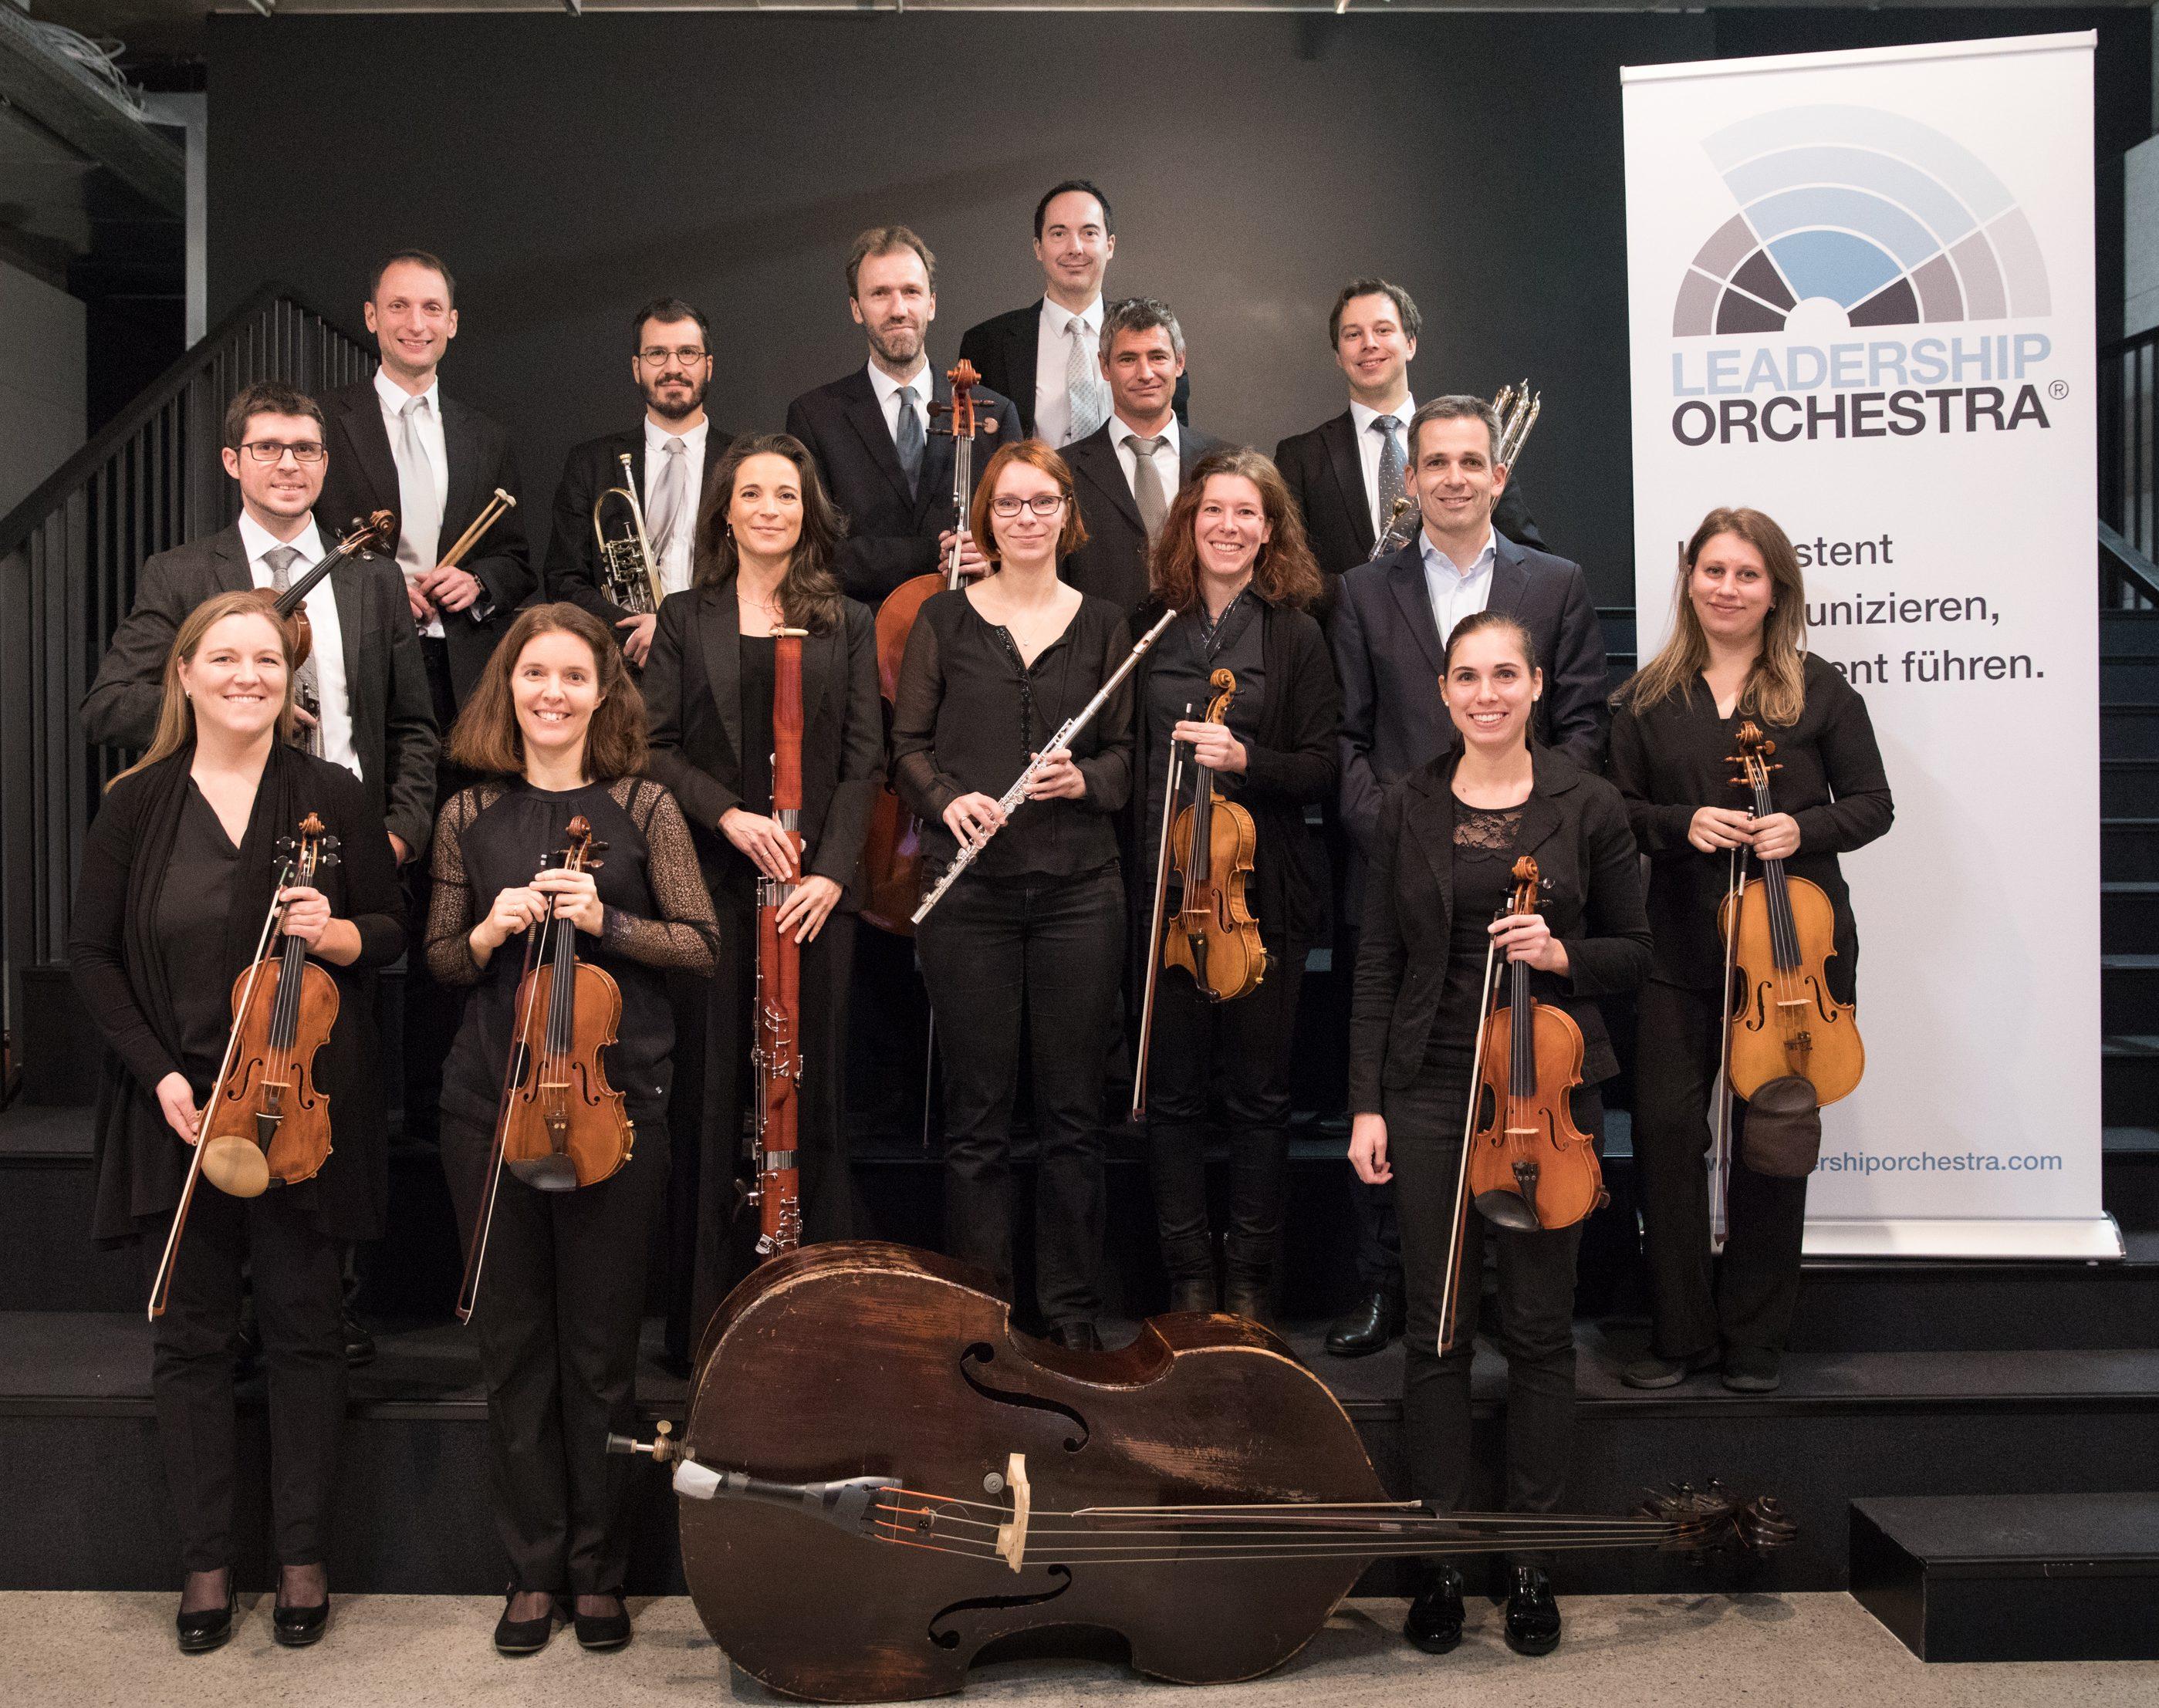 Leadership Orchestra Vienna